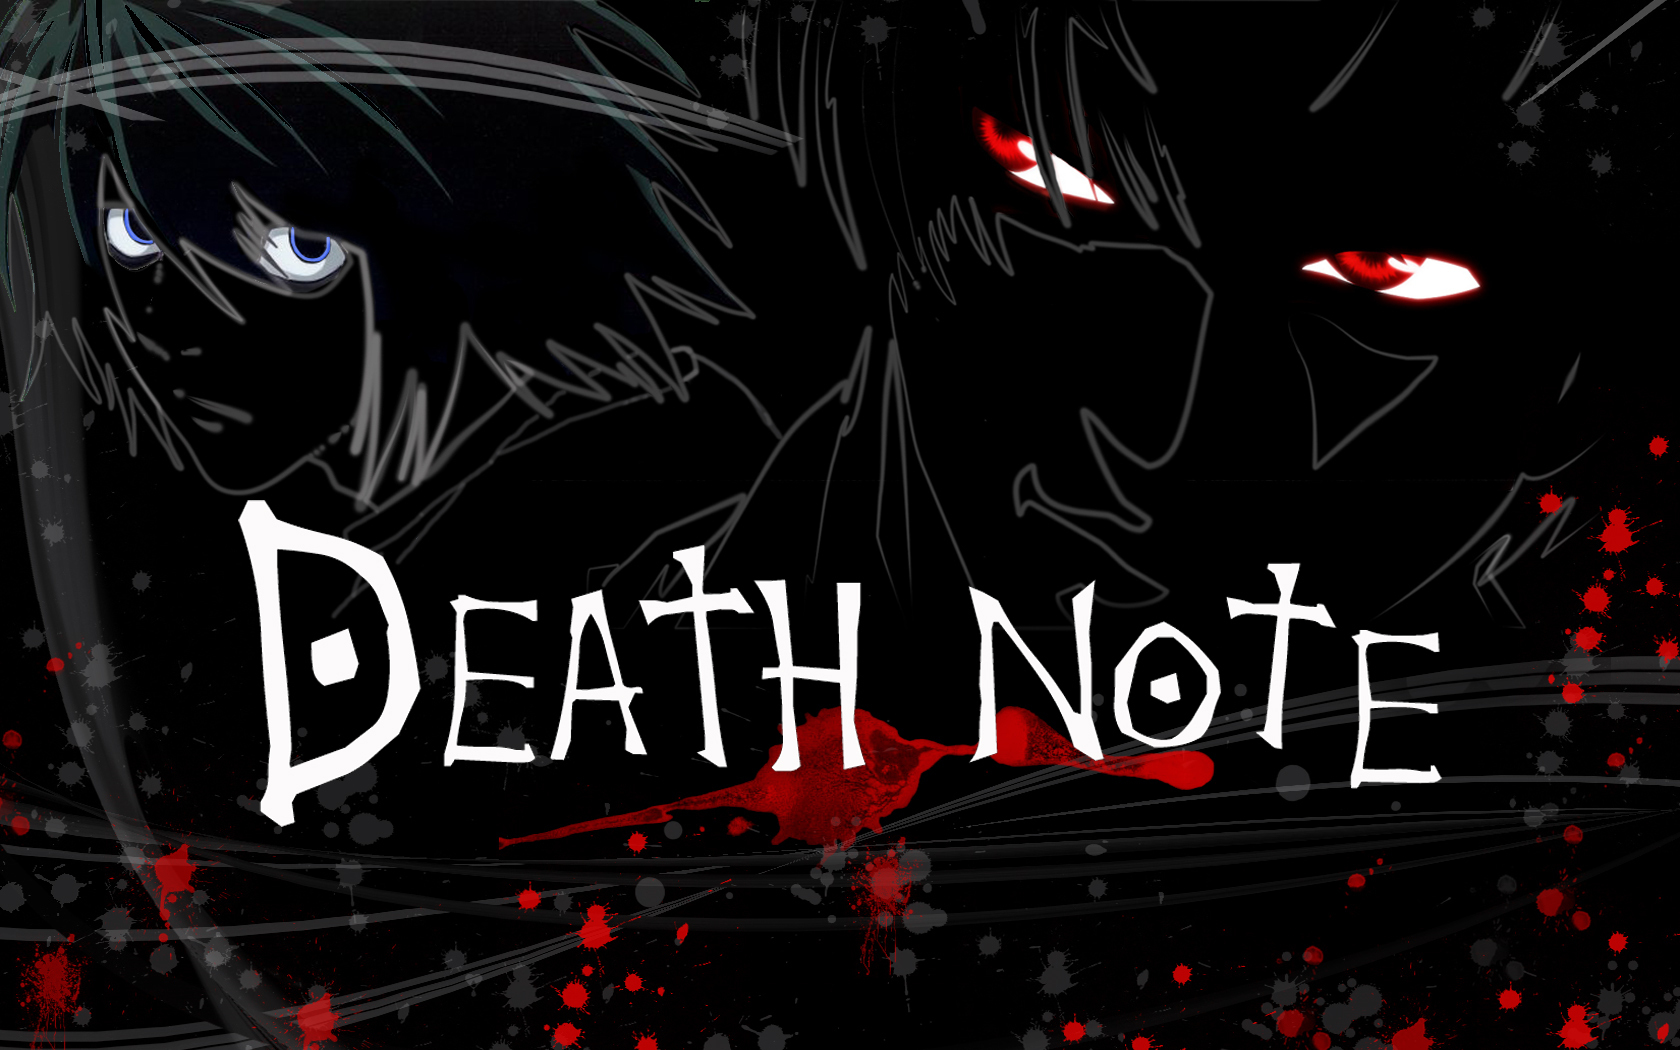 Hd Death Note Wallpaper 16 Anime Wallpaper Animewp Com